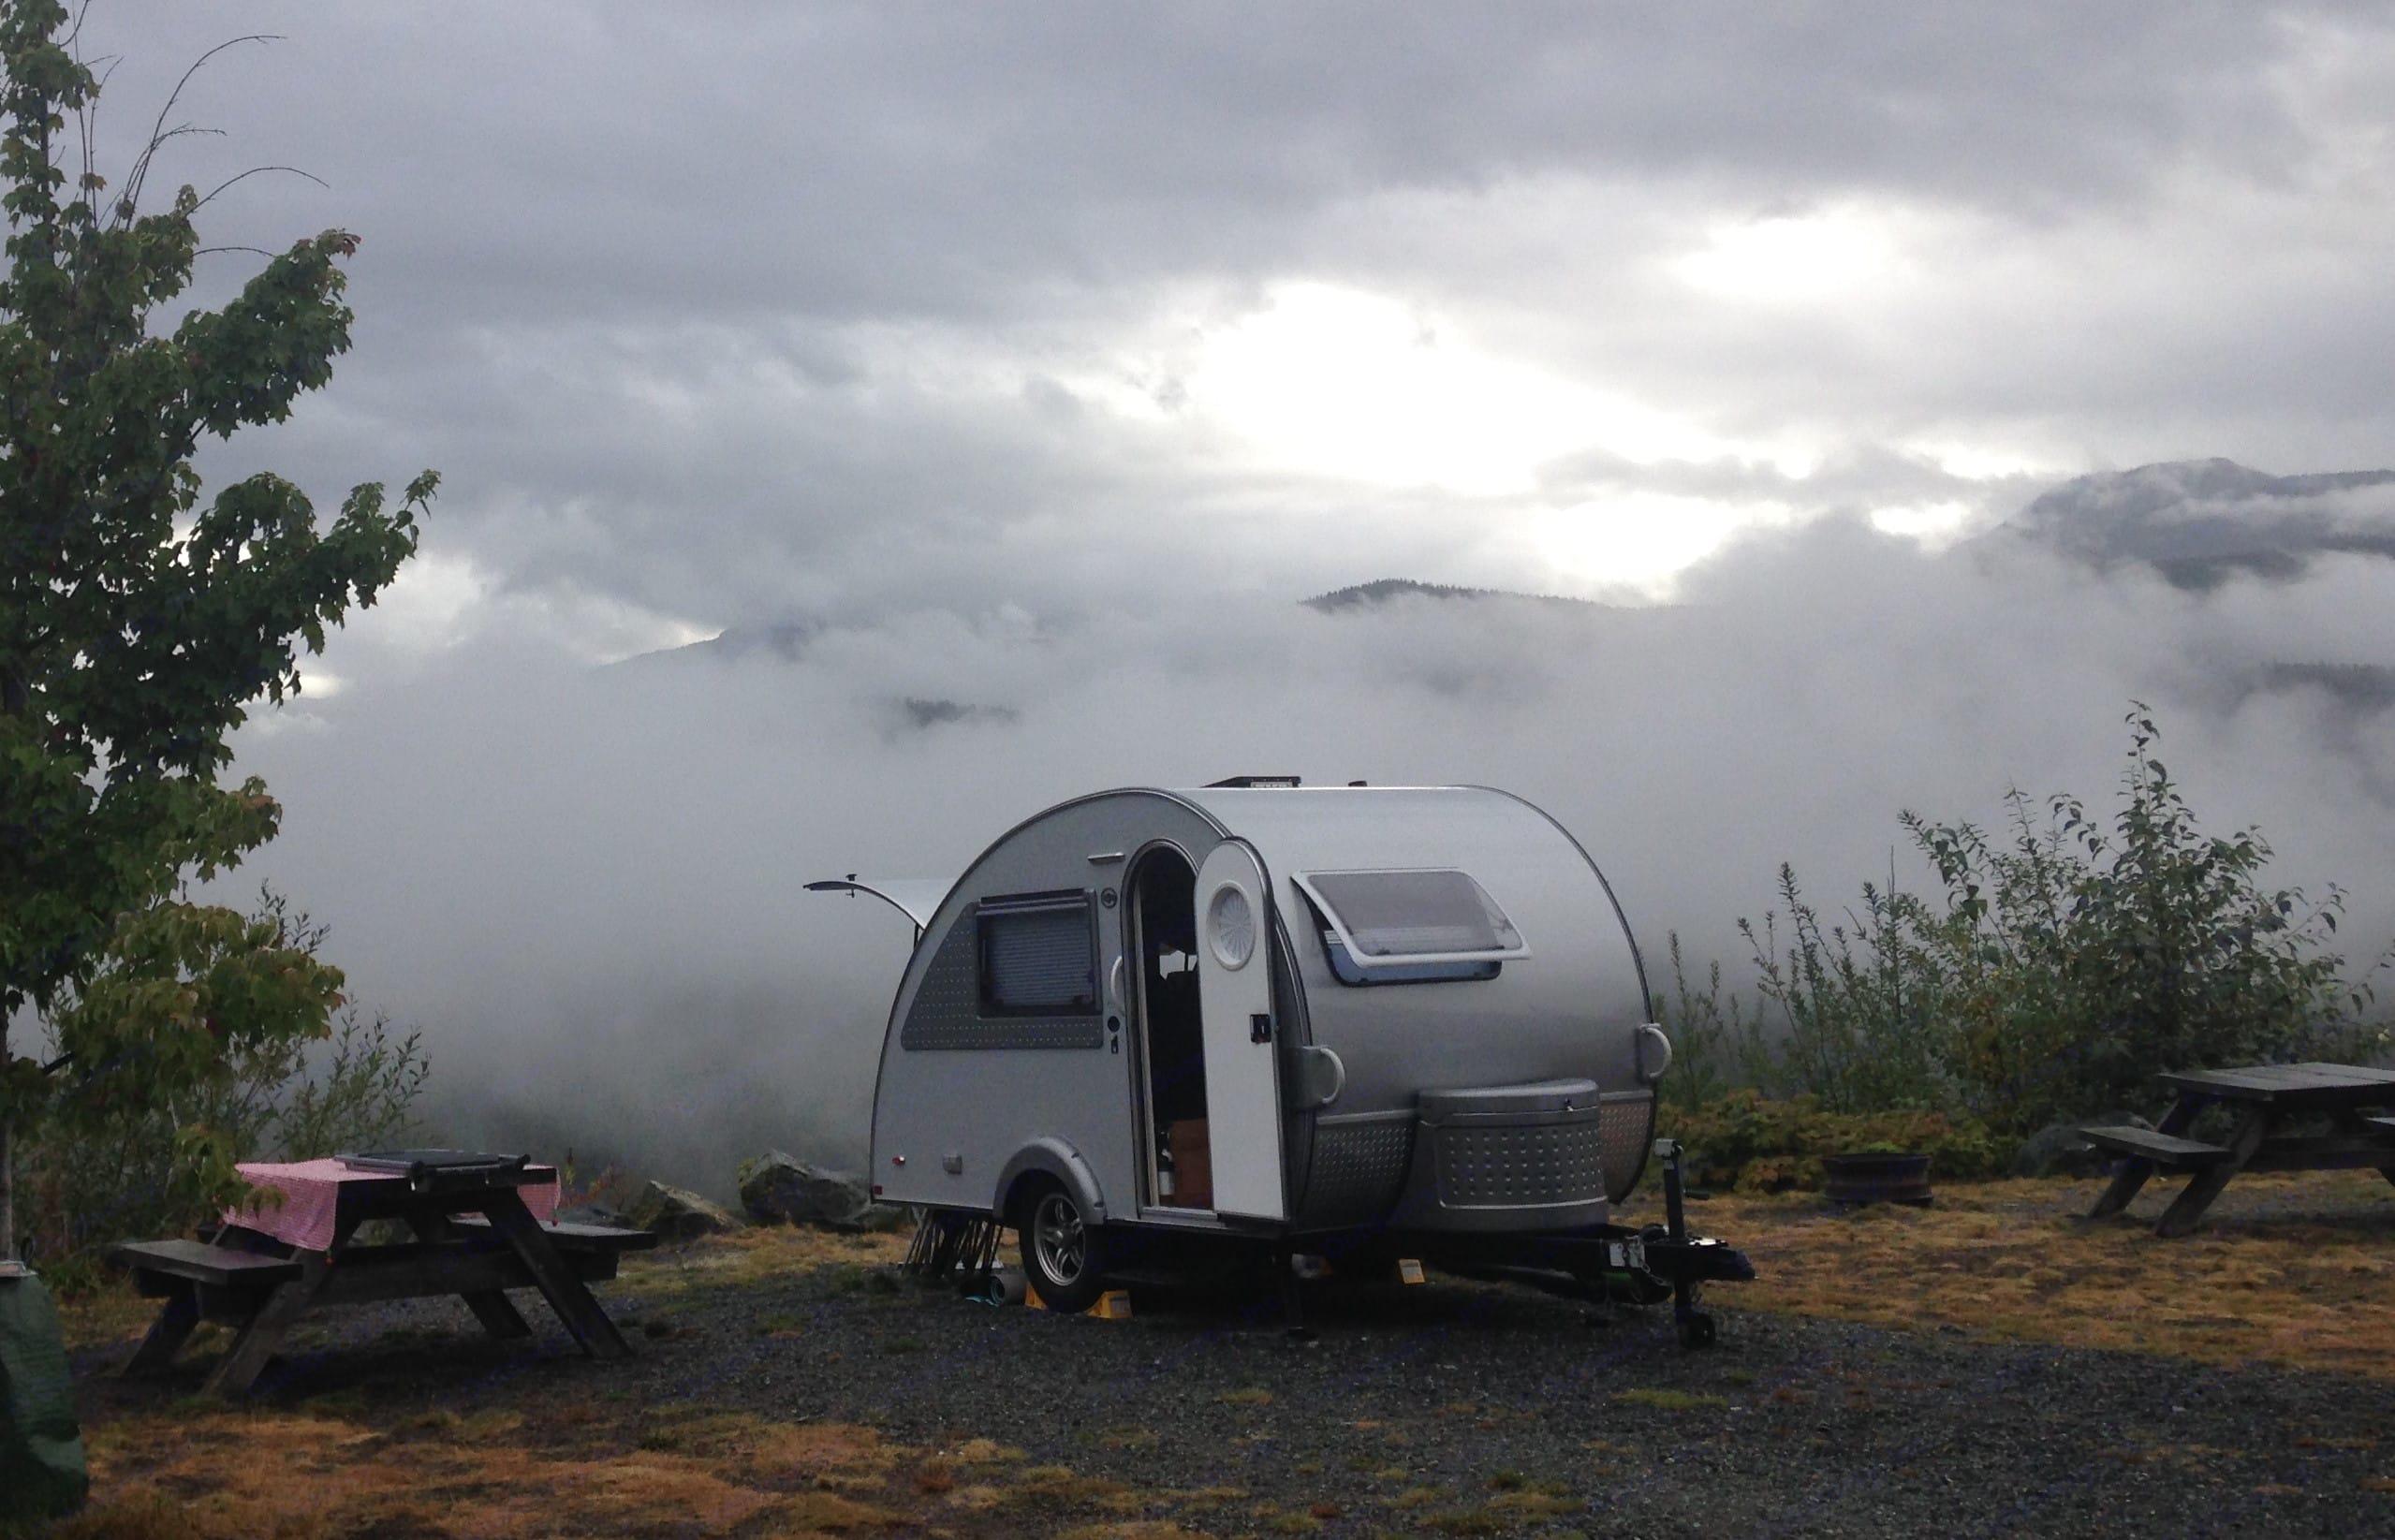 Camping near Whistler, BC. T@B 320 RS 2017